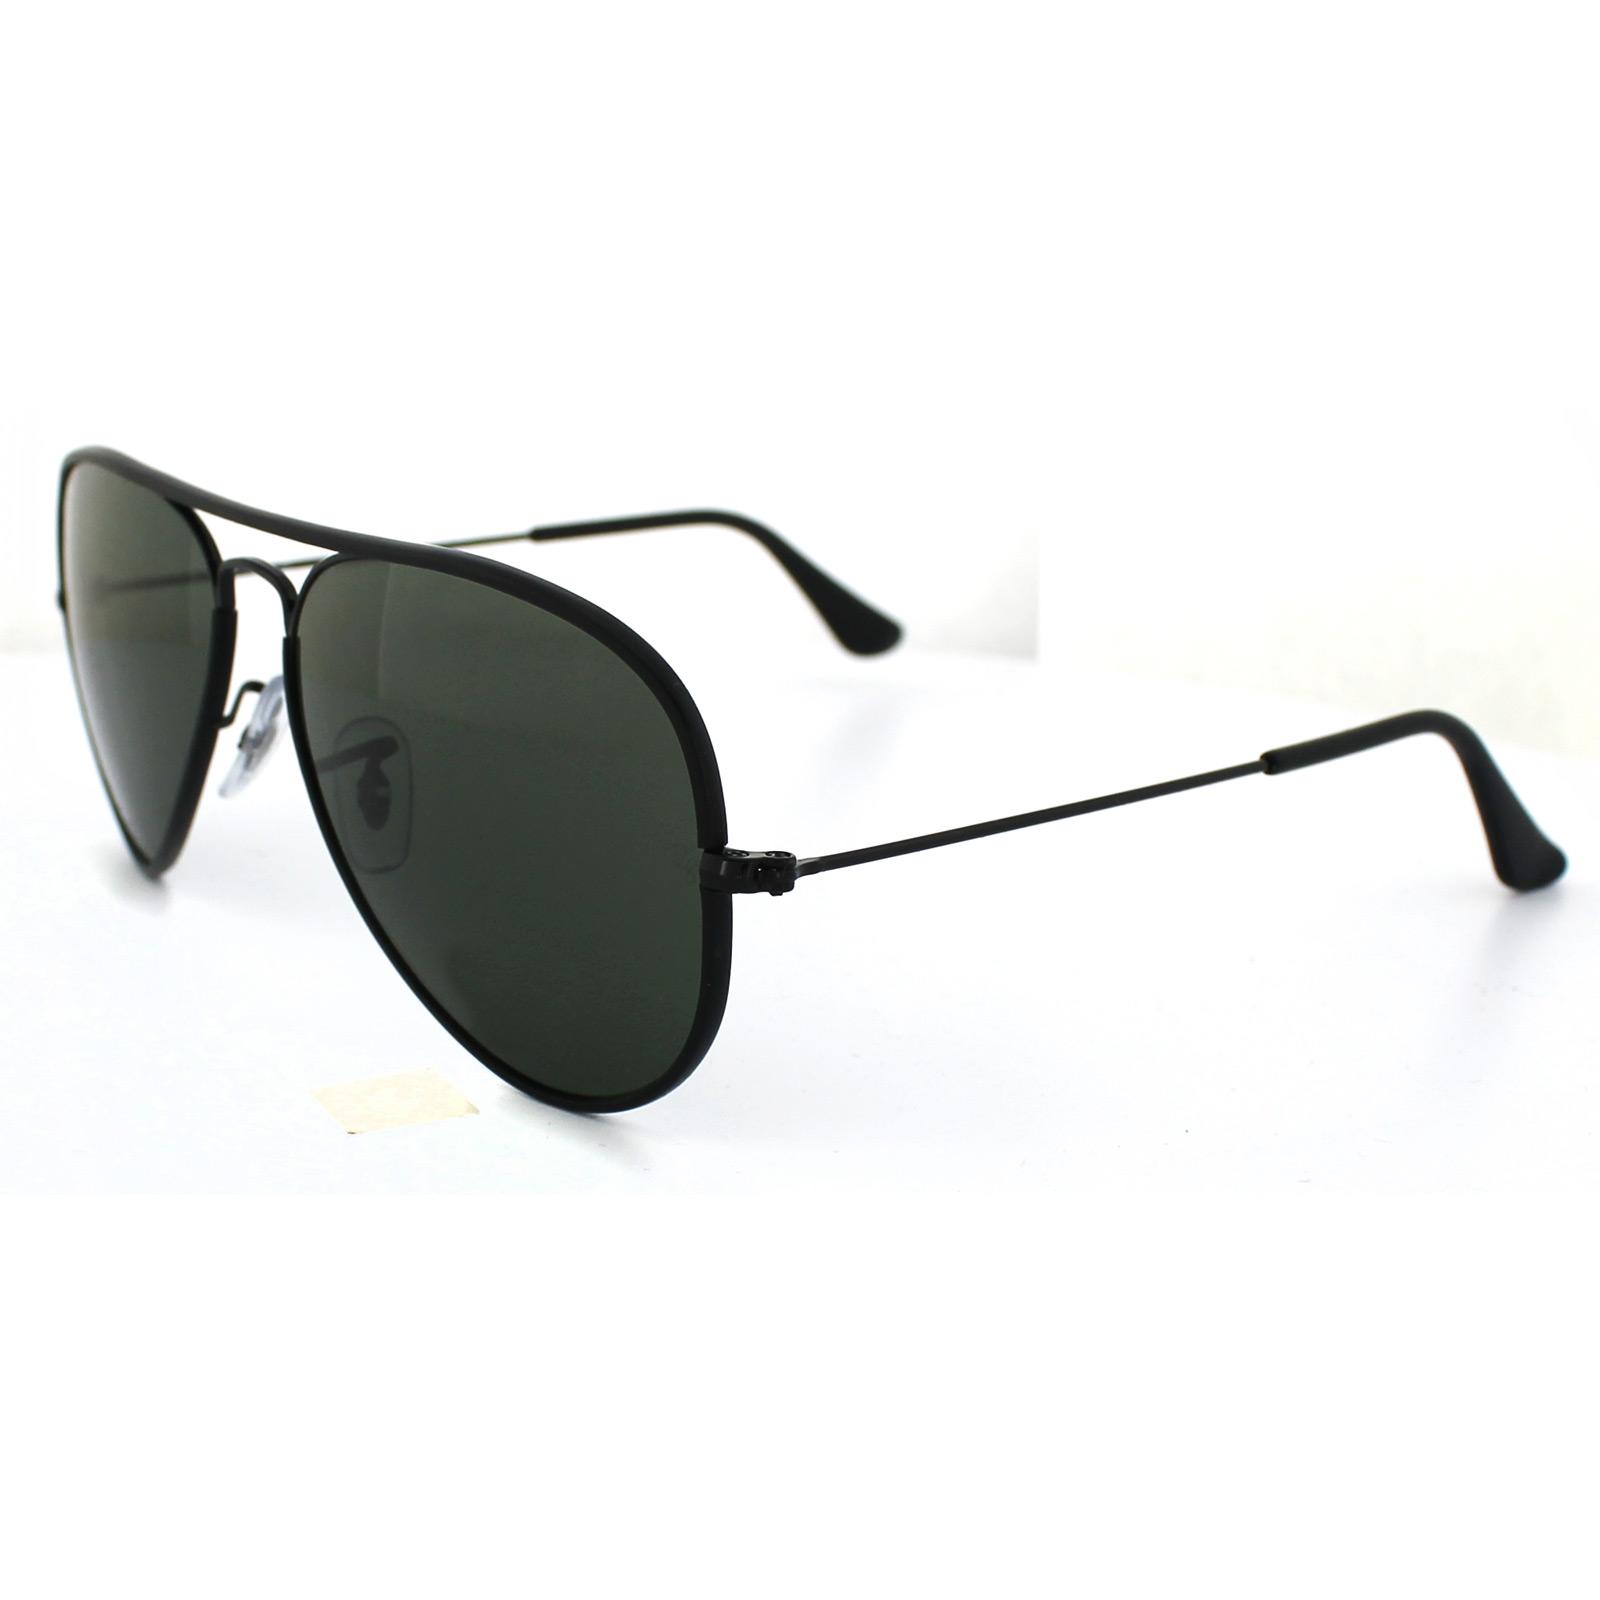 Cheap Ray Ban Sunglasses Ebay